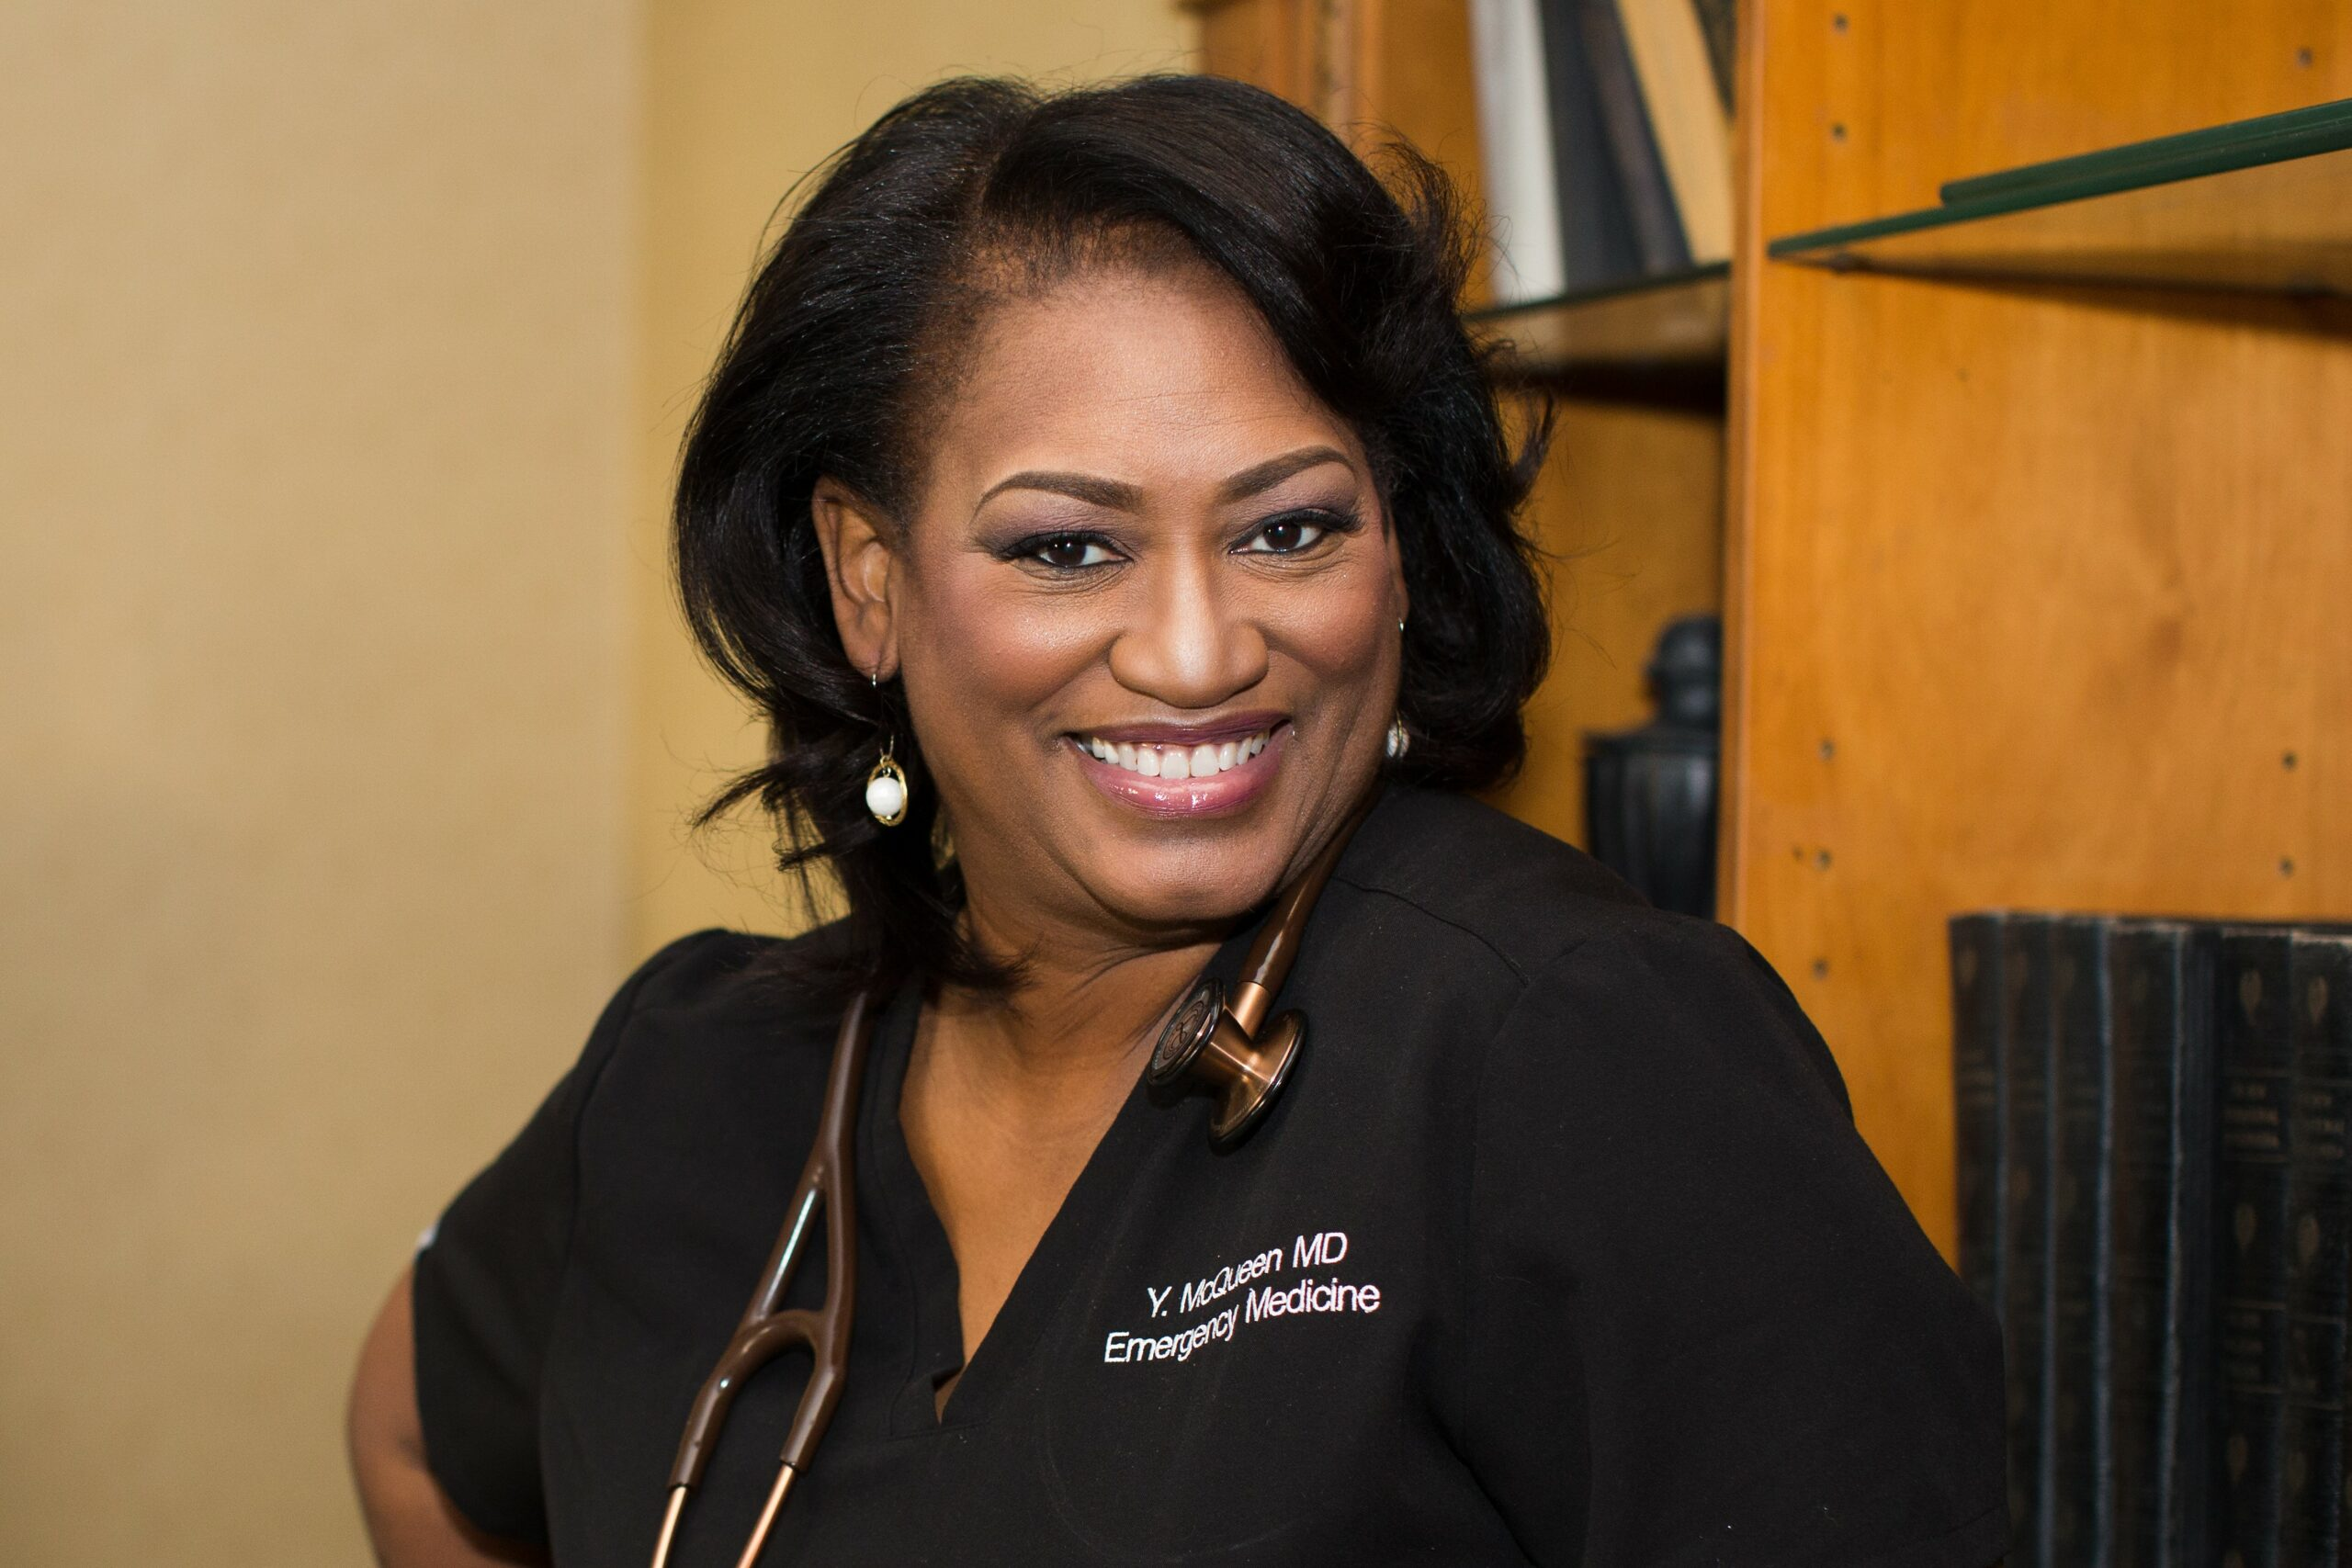 Dr. Yvette McQueen, the Travel Doctor & Global physician